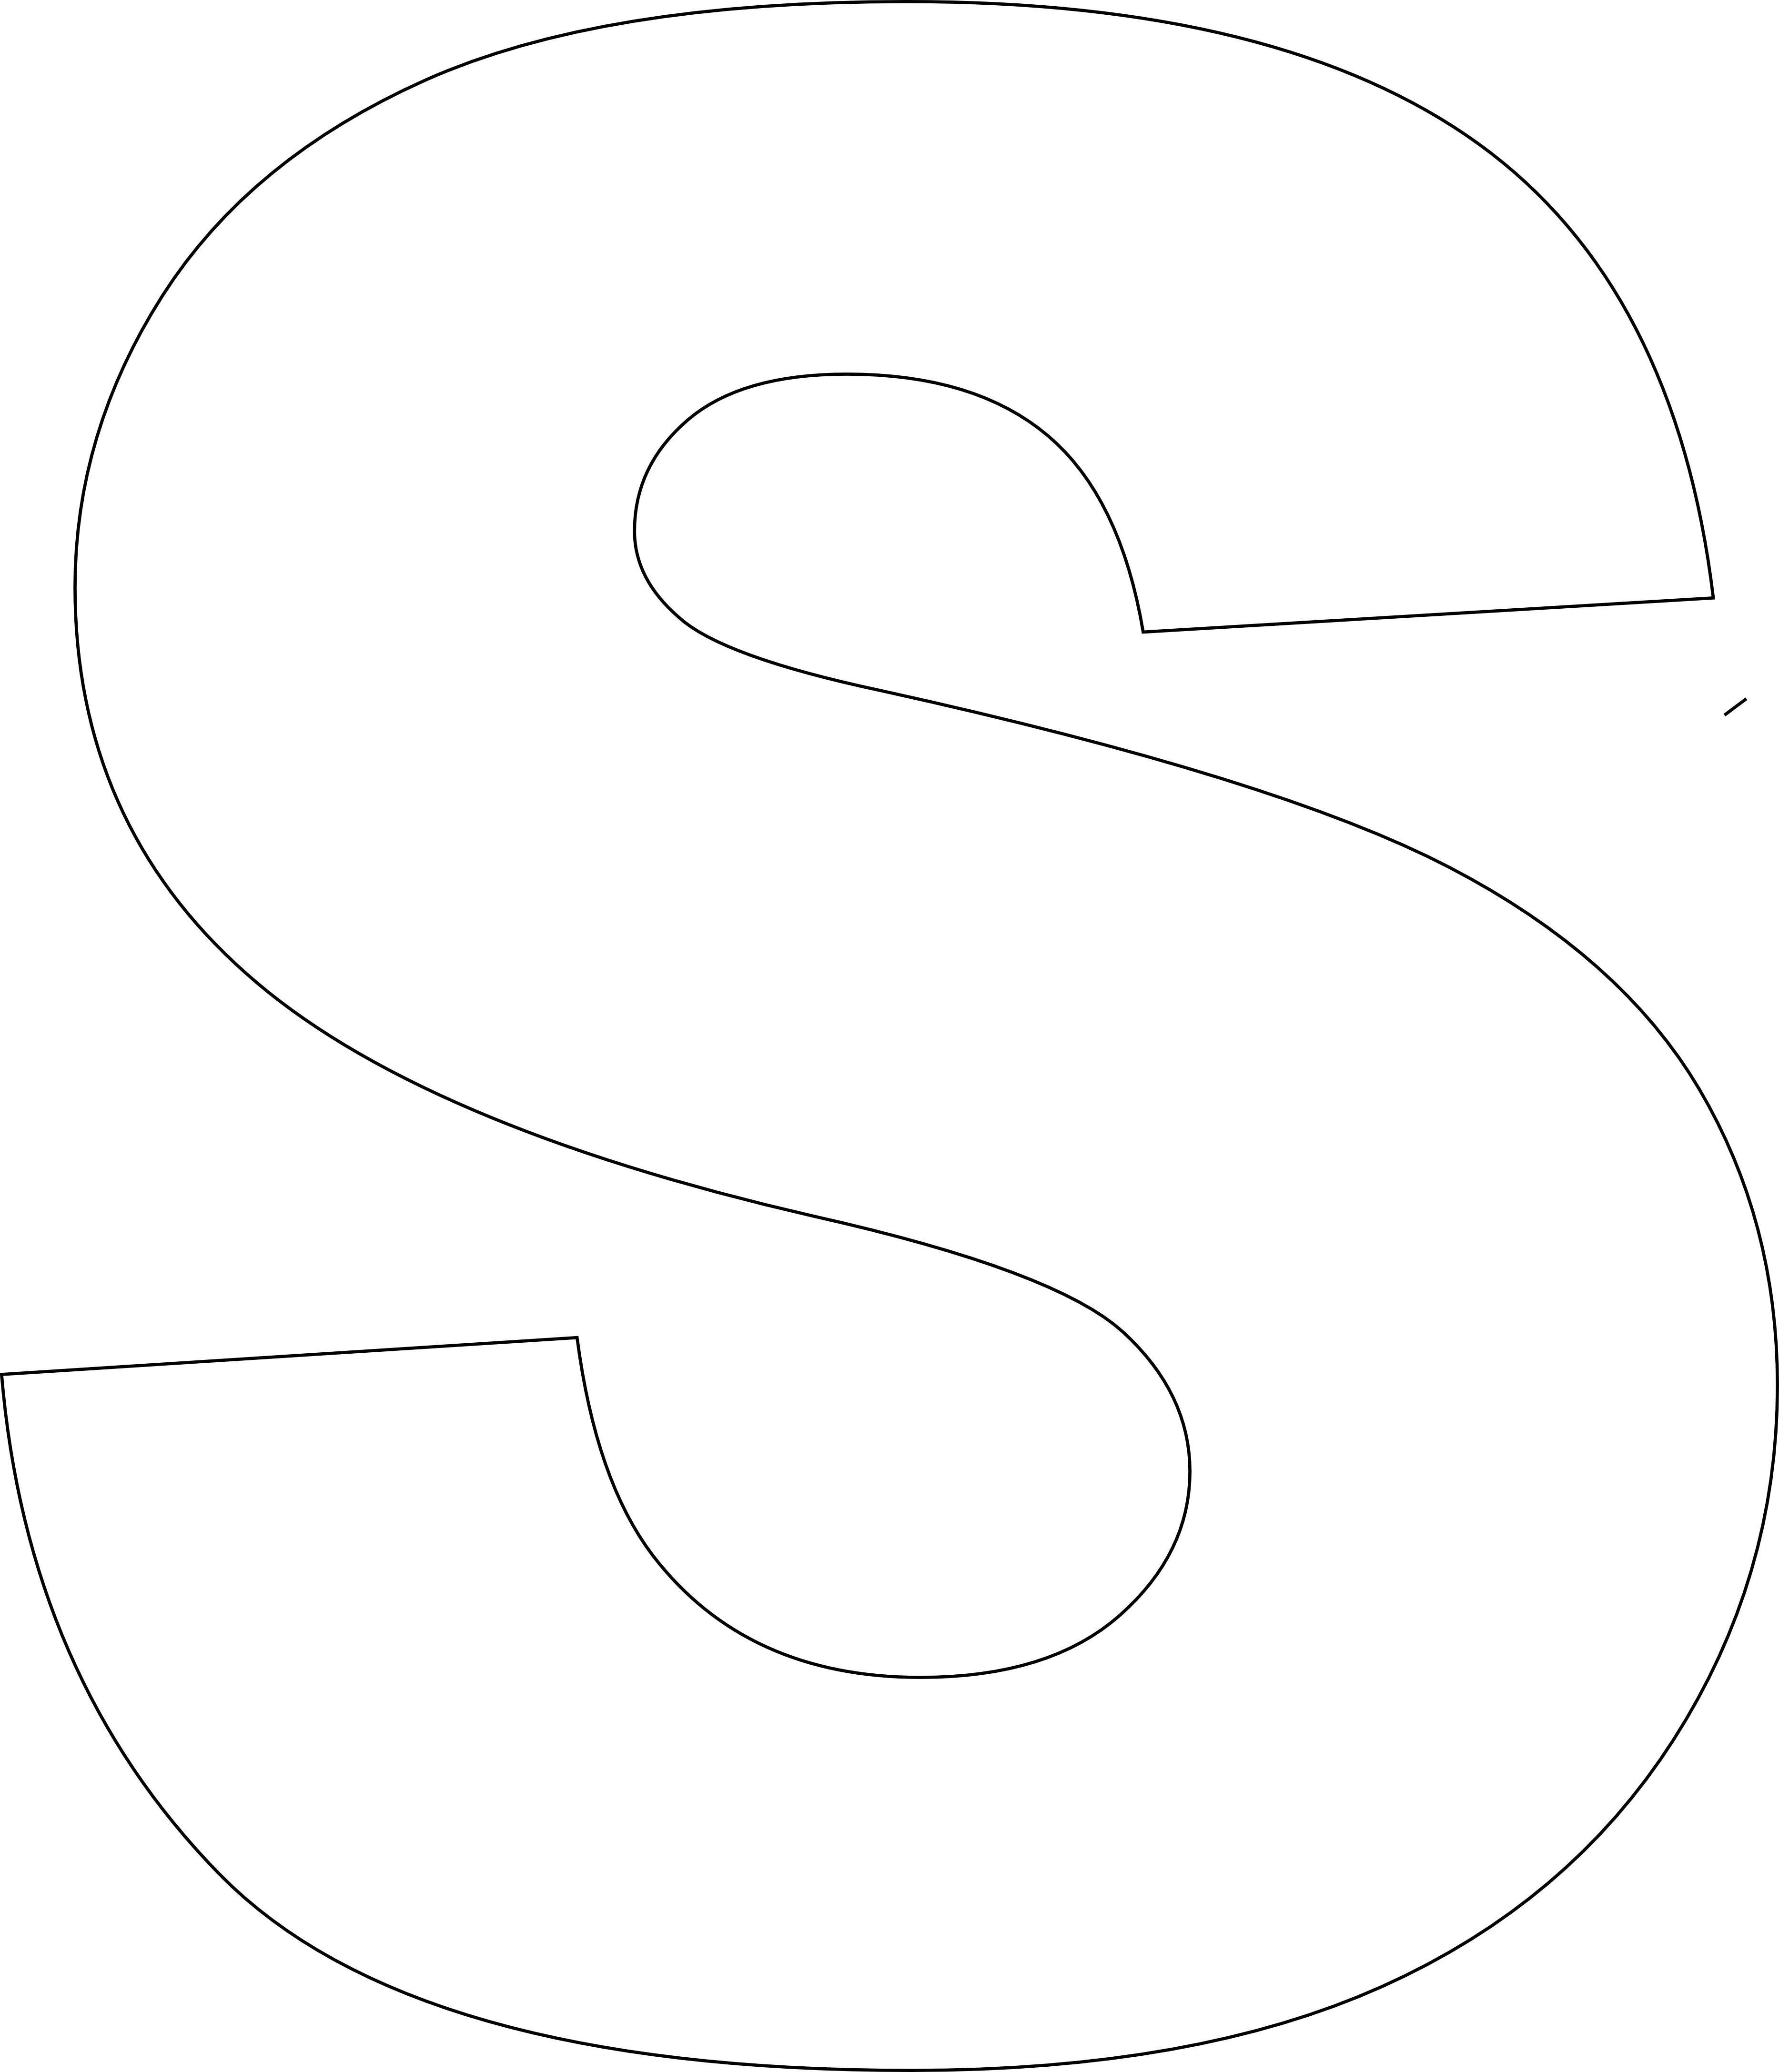 Free Printable Upper Case Alphabet Template | Craft Ideas | Alphabet - Free Printable Photo Letter Art